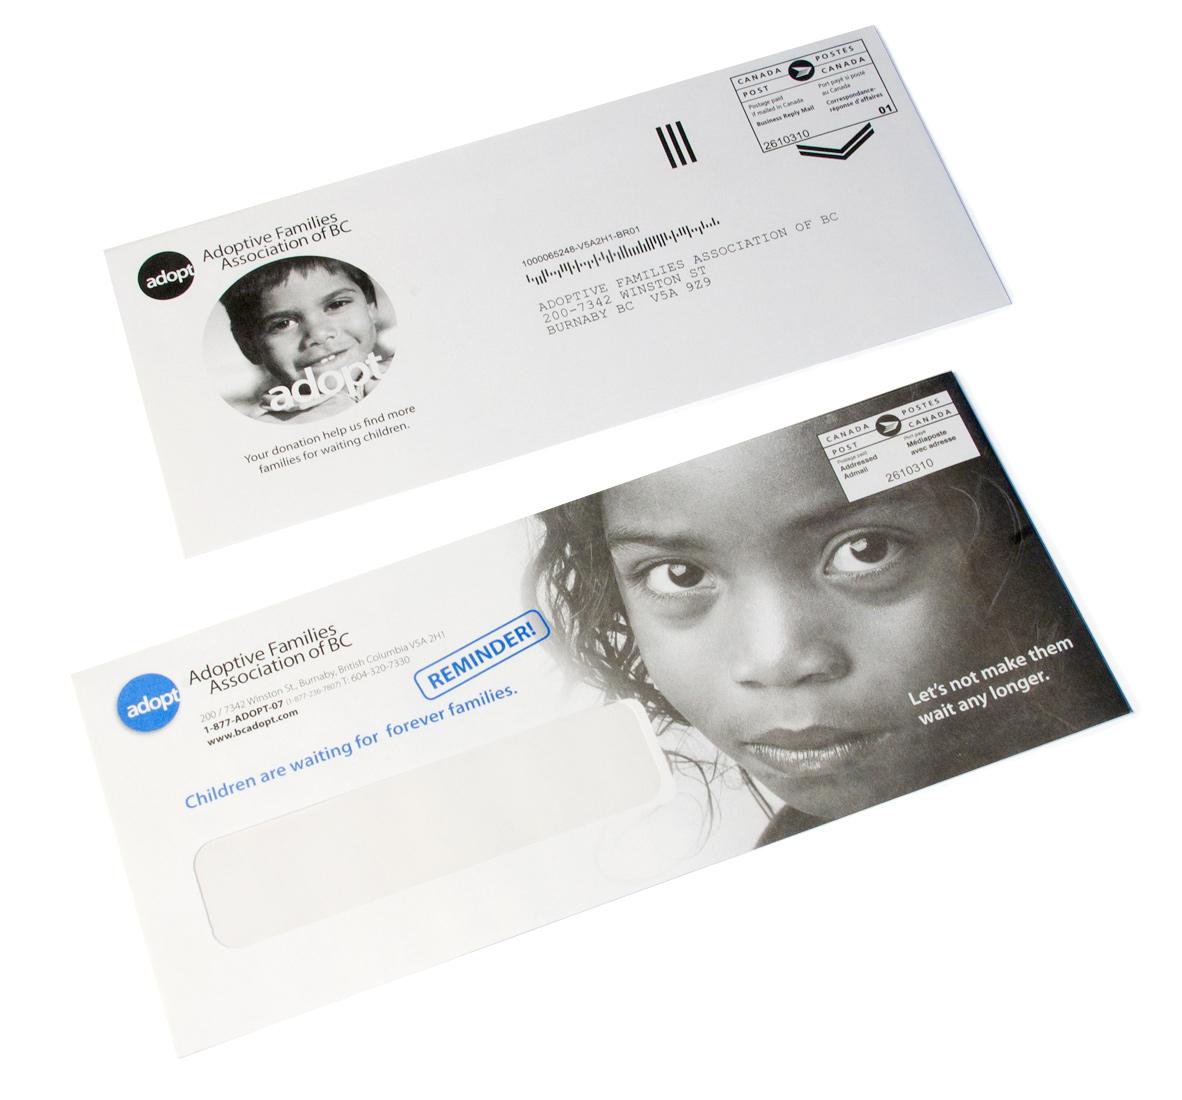 afabc_envelope